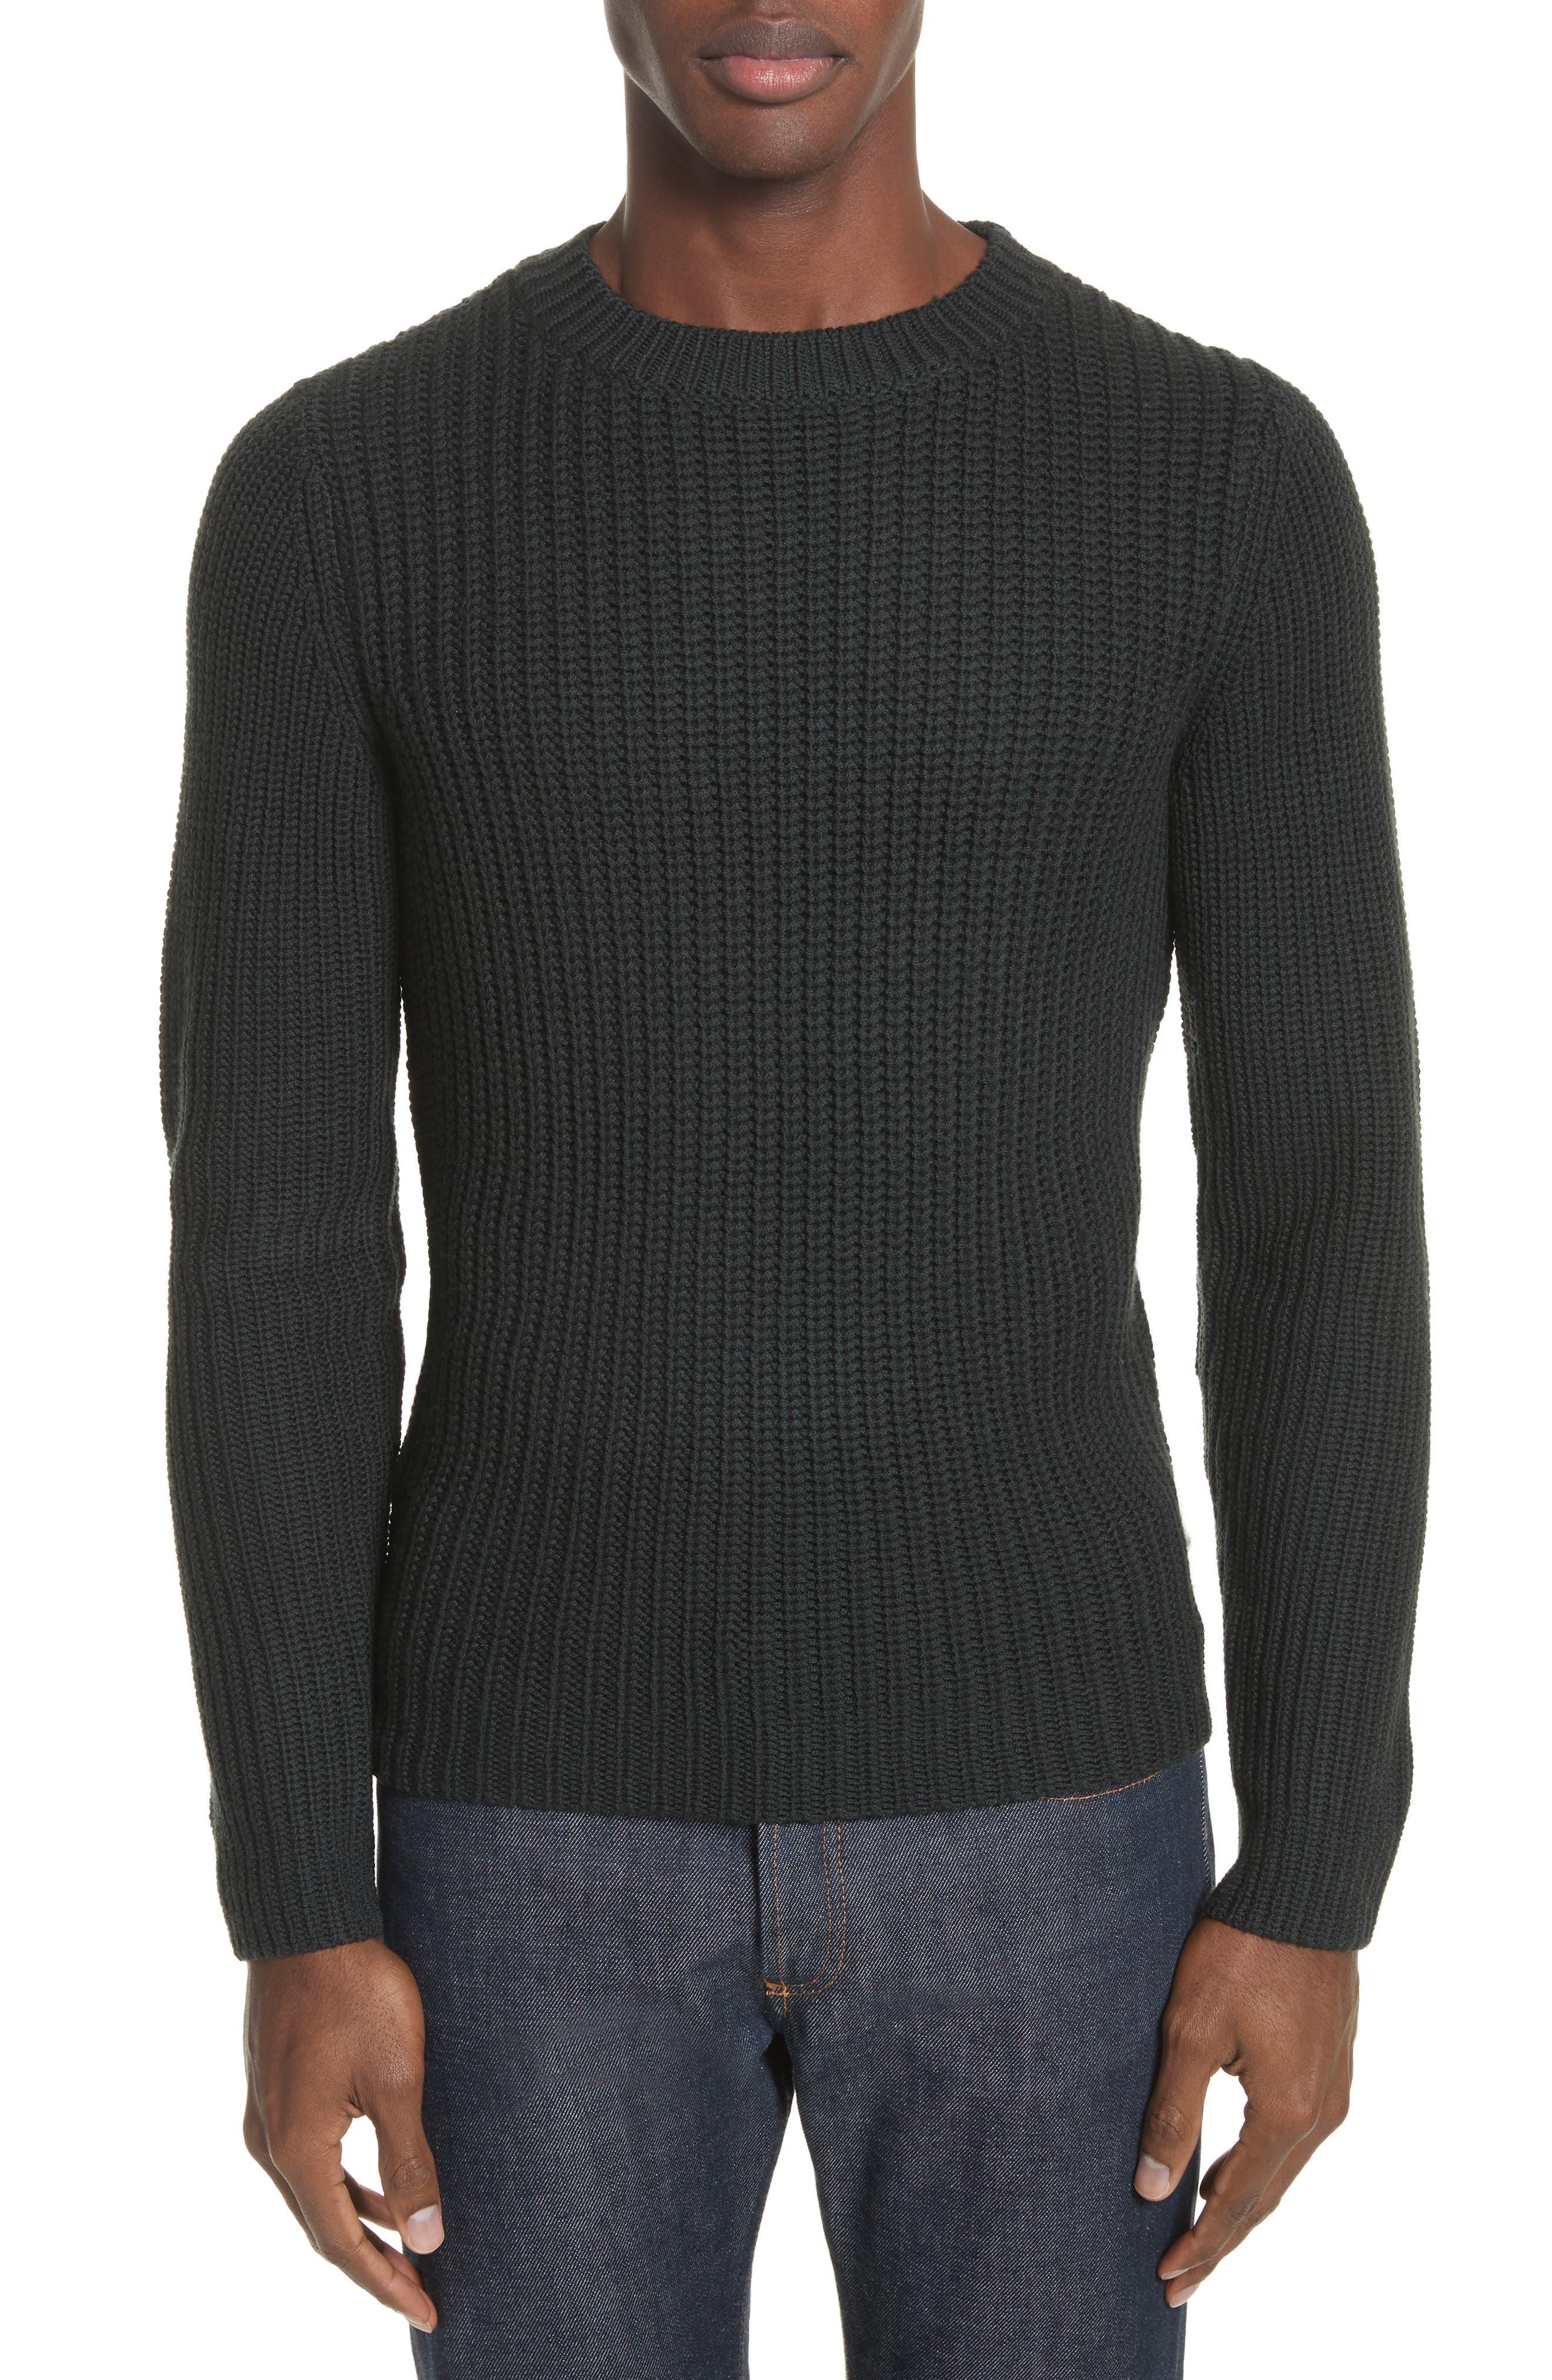 Pull Berger Merino Wool Sweater,                             Main thumbnail 1, color,                             Khaki Green